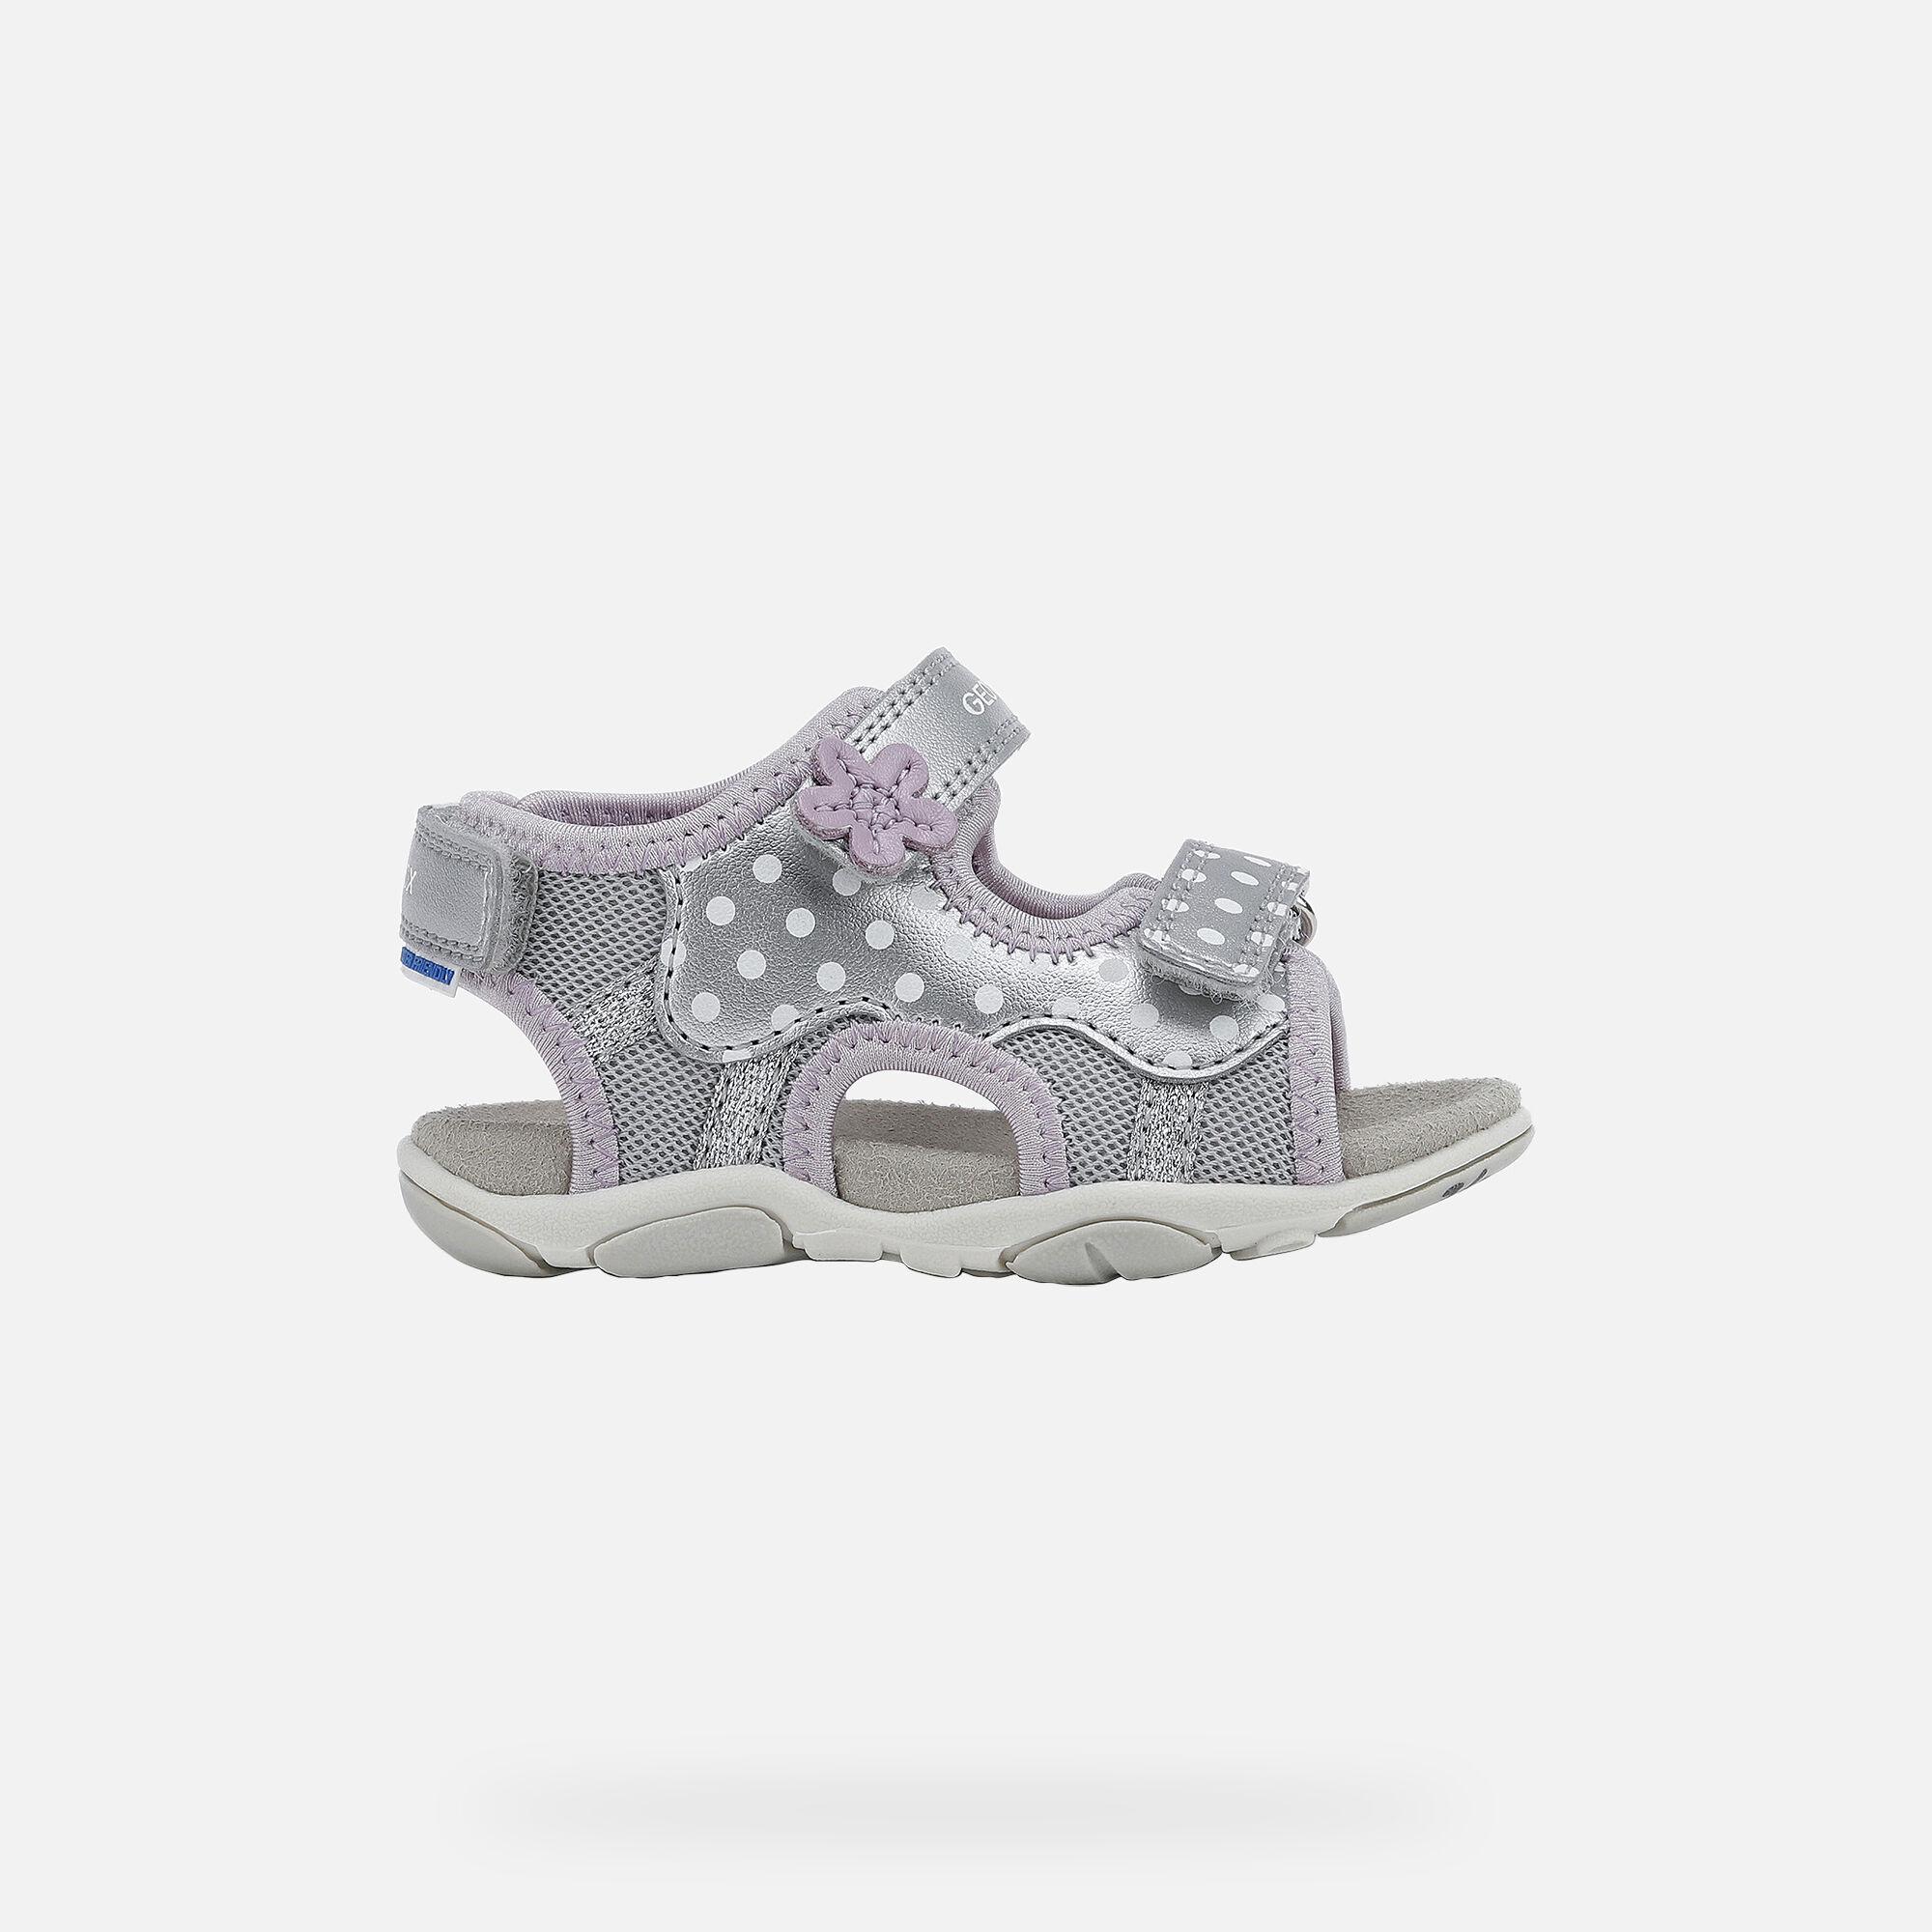 Geox AGASIM Baby Girl: Silver Sandals